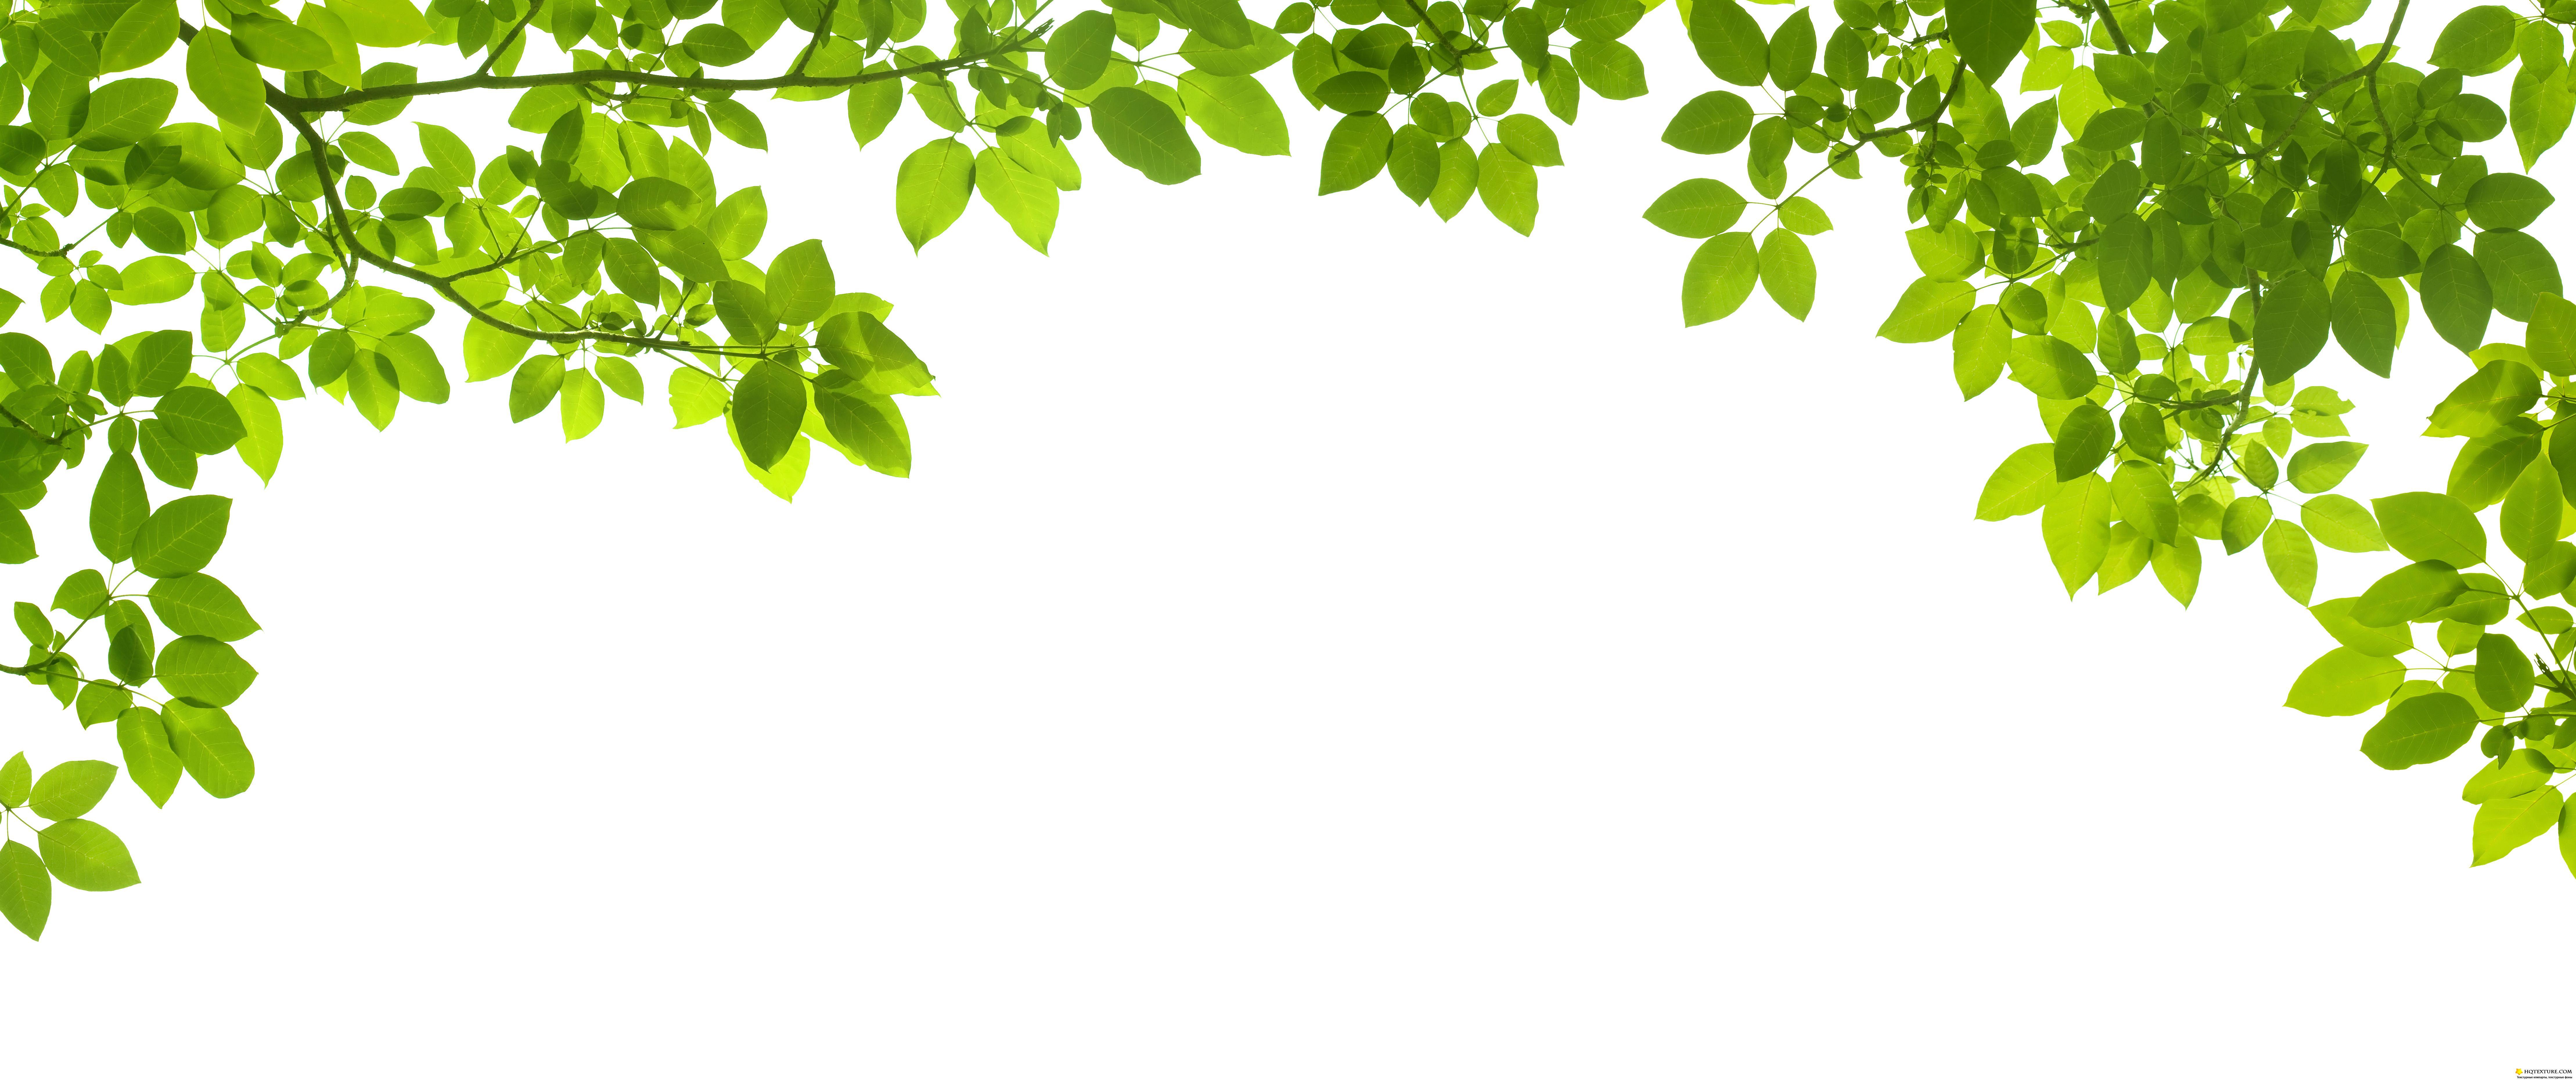 Green leave frame - UHQ Stock Photo | Рамки из зеленых ...